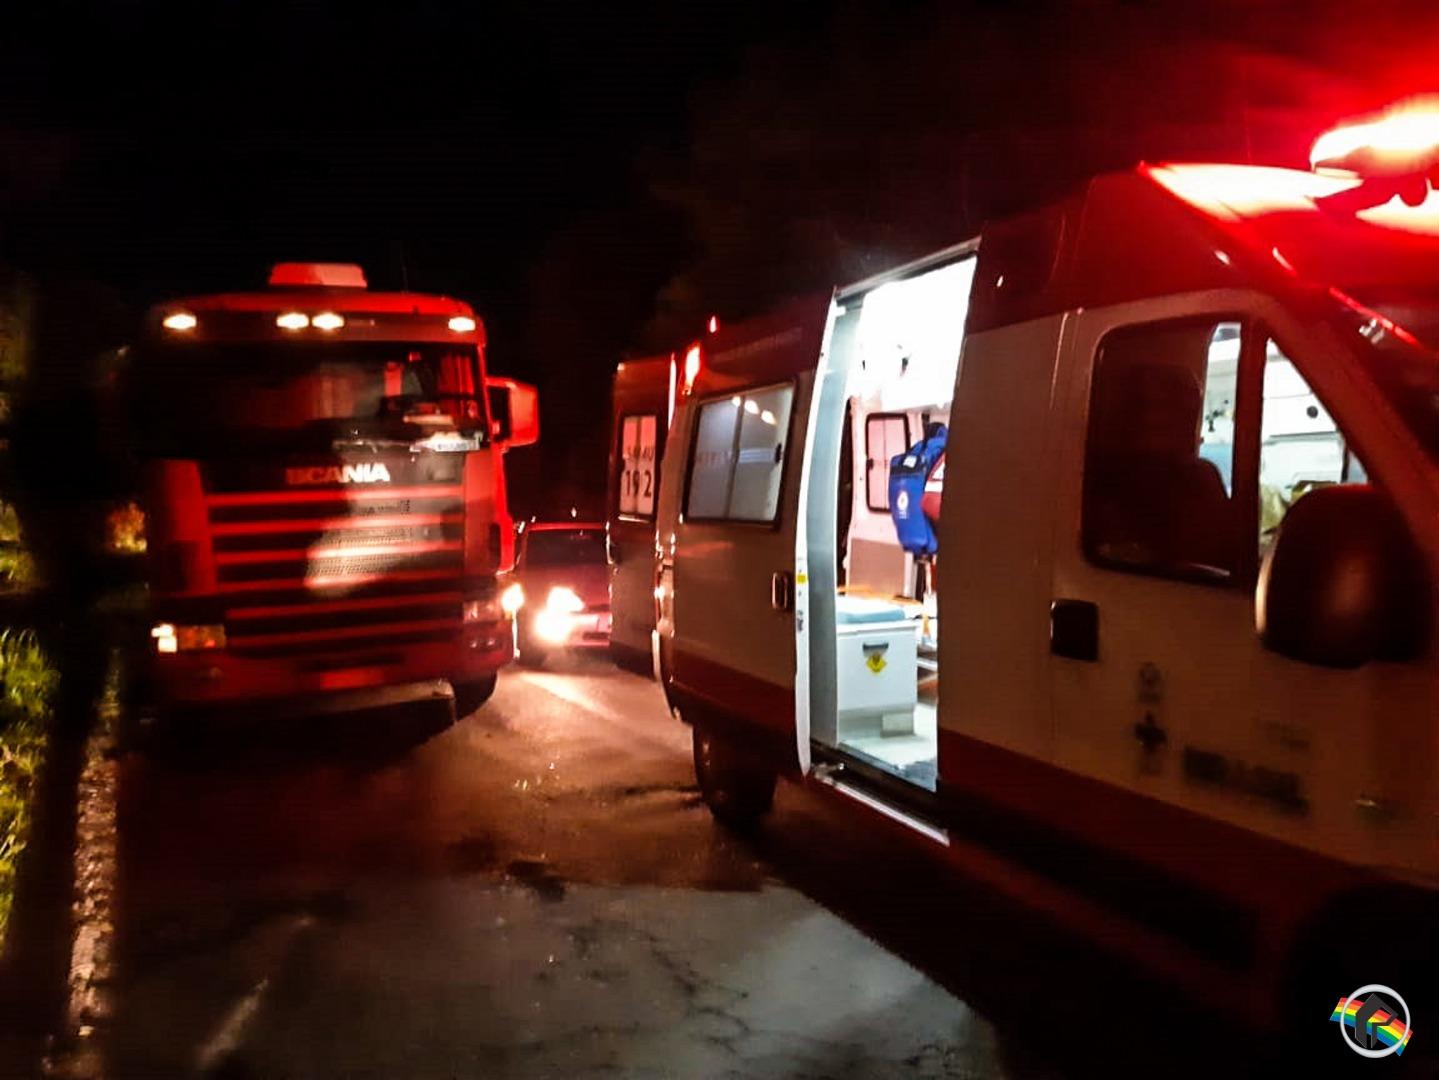 VÍDEO: Acidente na BR-282 deixa mulher ferida